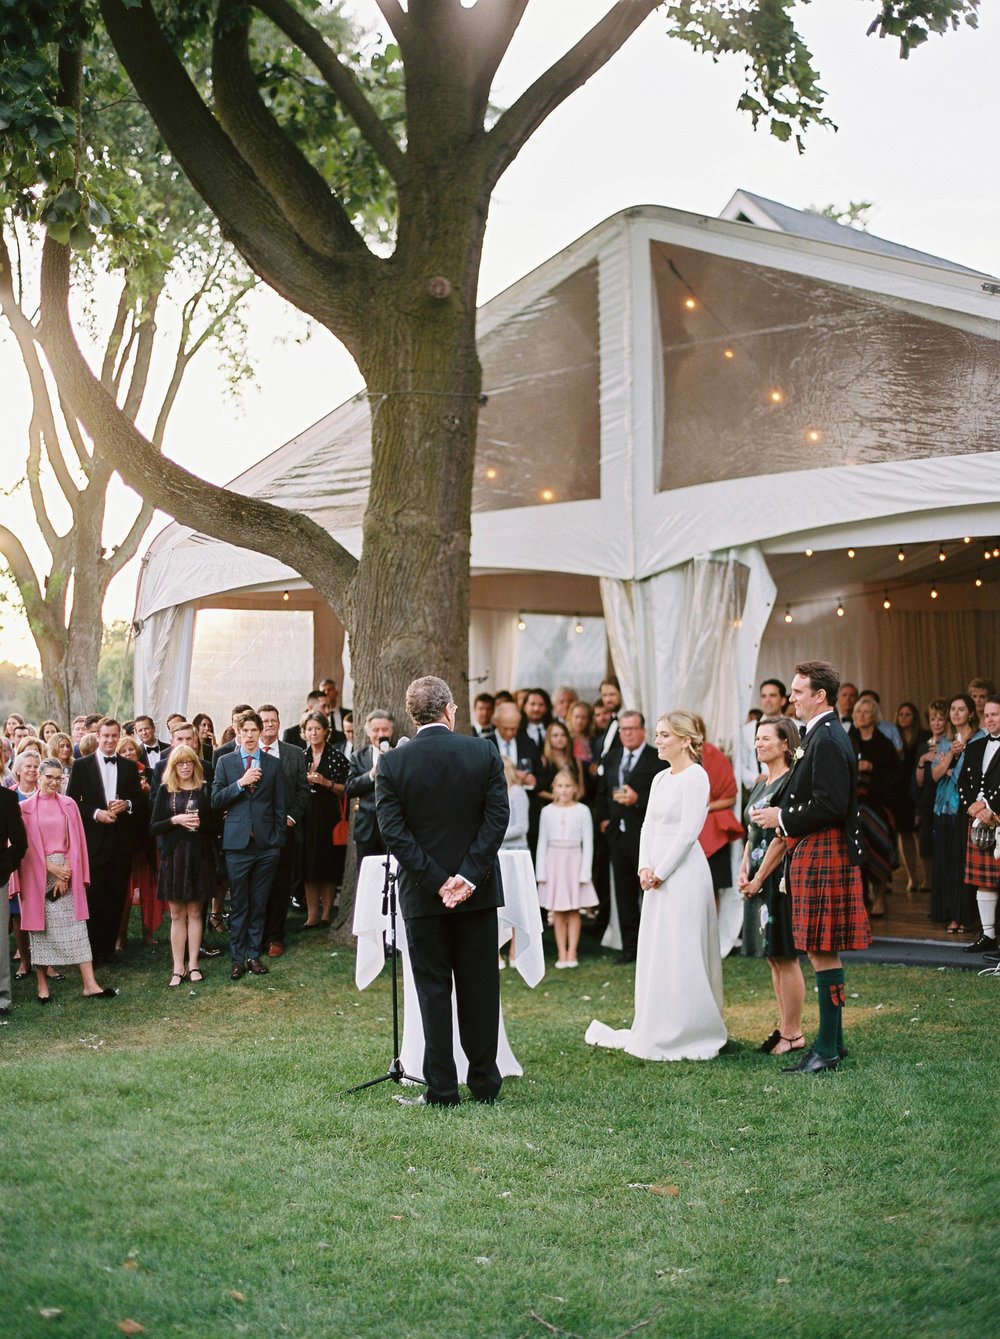 0655-Geneva-Ian-Wedding-Toronto Golf Club-When He Found Her-TorontoPhotographer.jpg